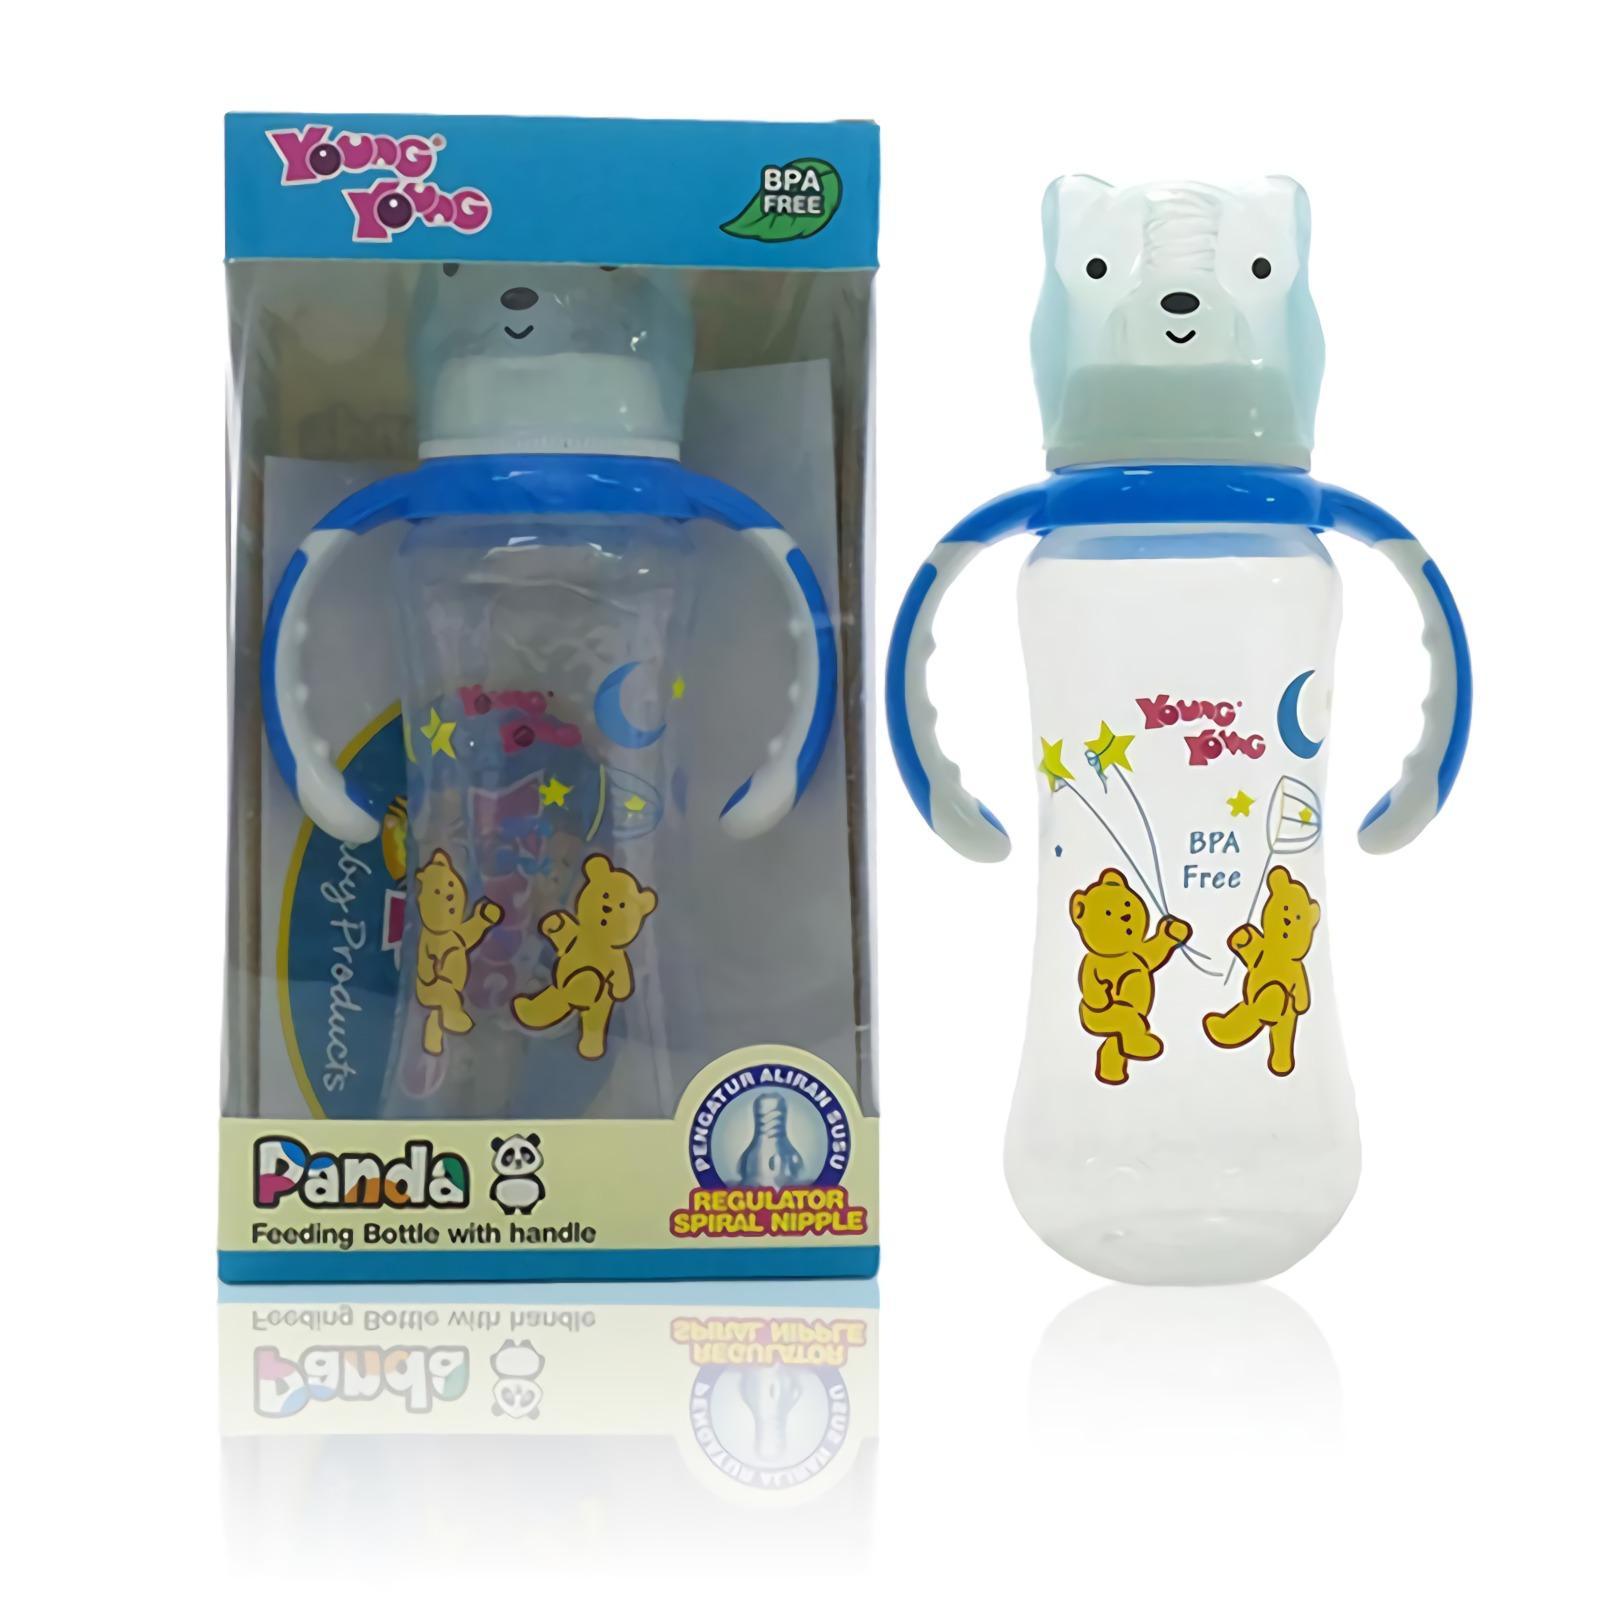 YOUNG YOUNG Botol Susu [250ML] Panda Feeding Bottle Handle Asi BPA Free IL-